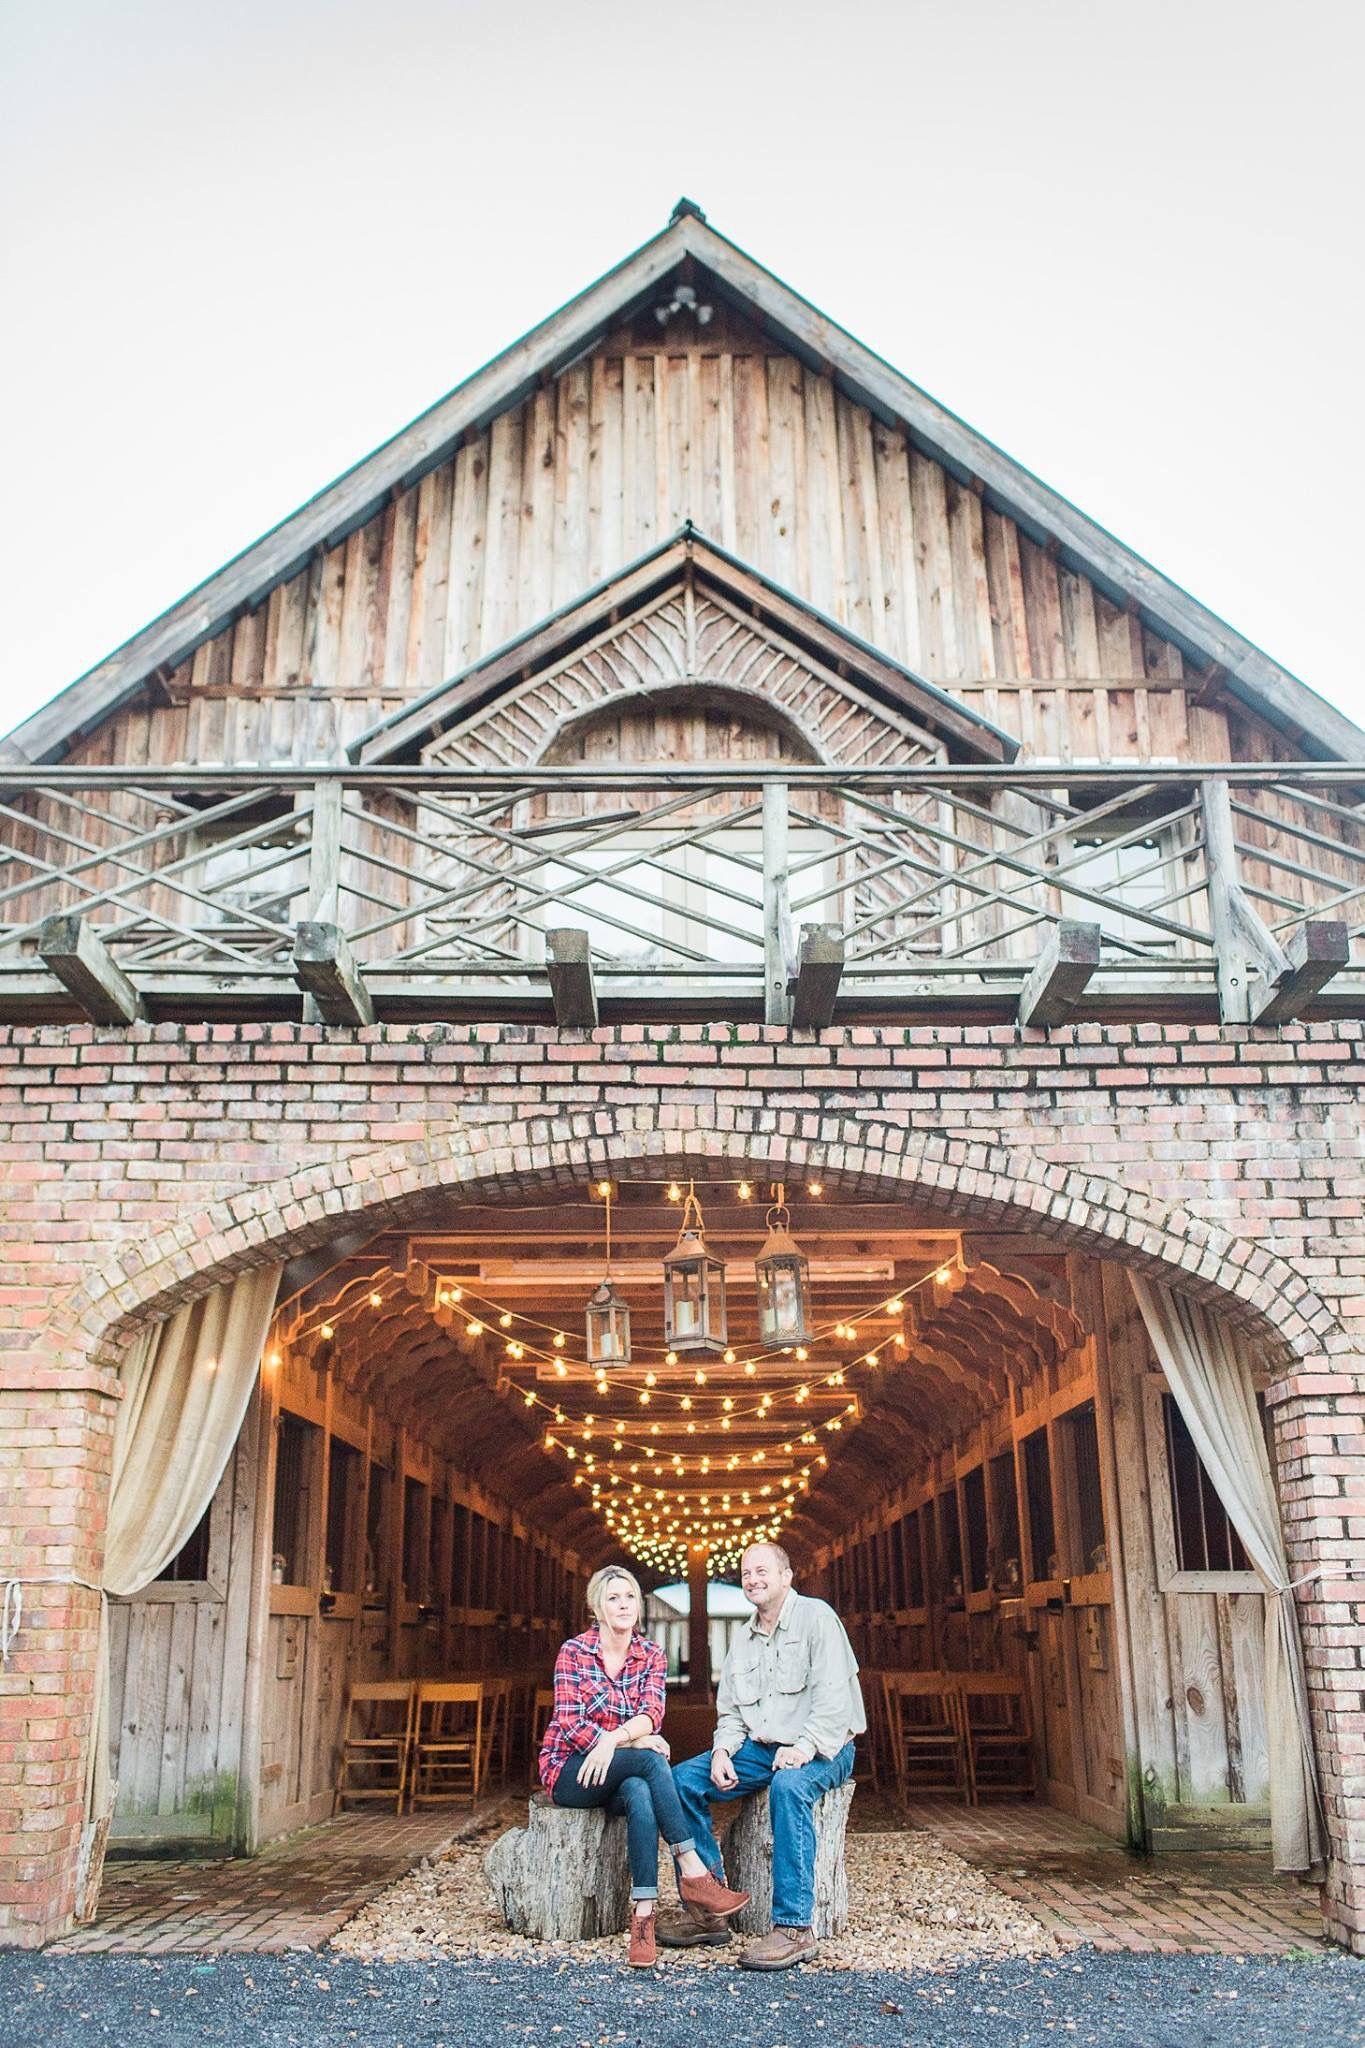 The Farm Rome Ga Wedding Venue | Barn wedding venue, Ga ...